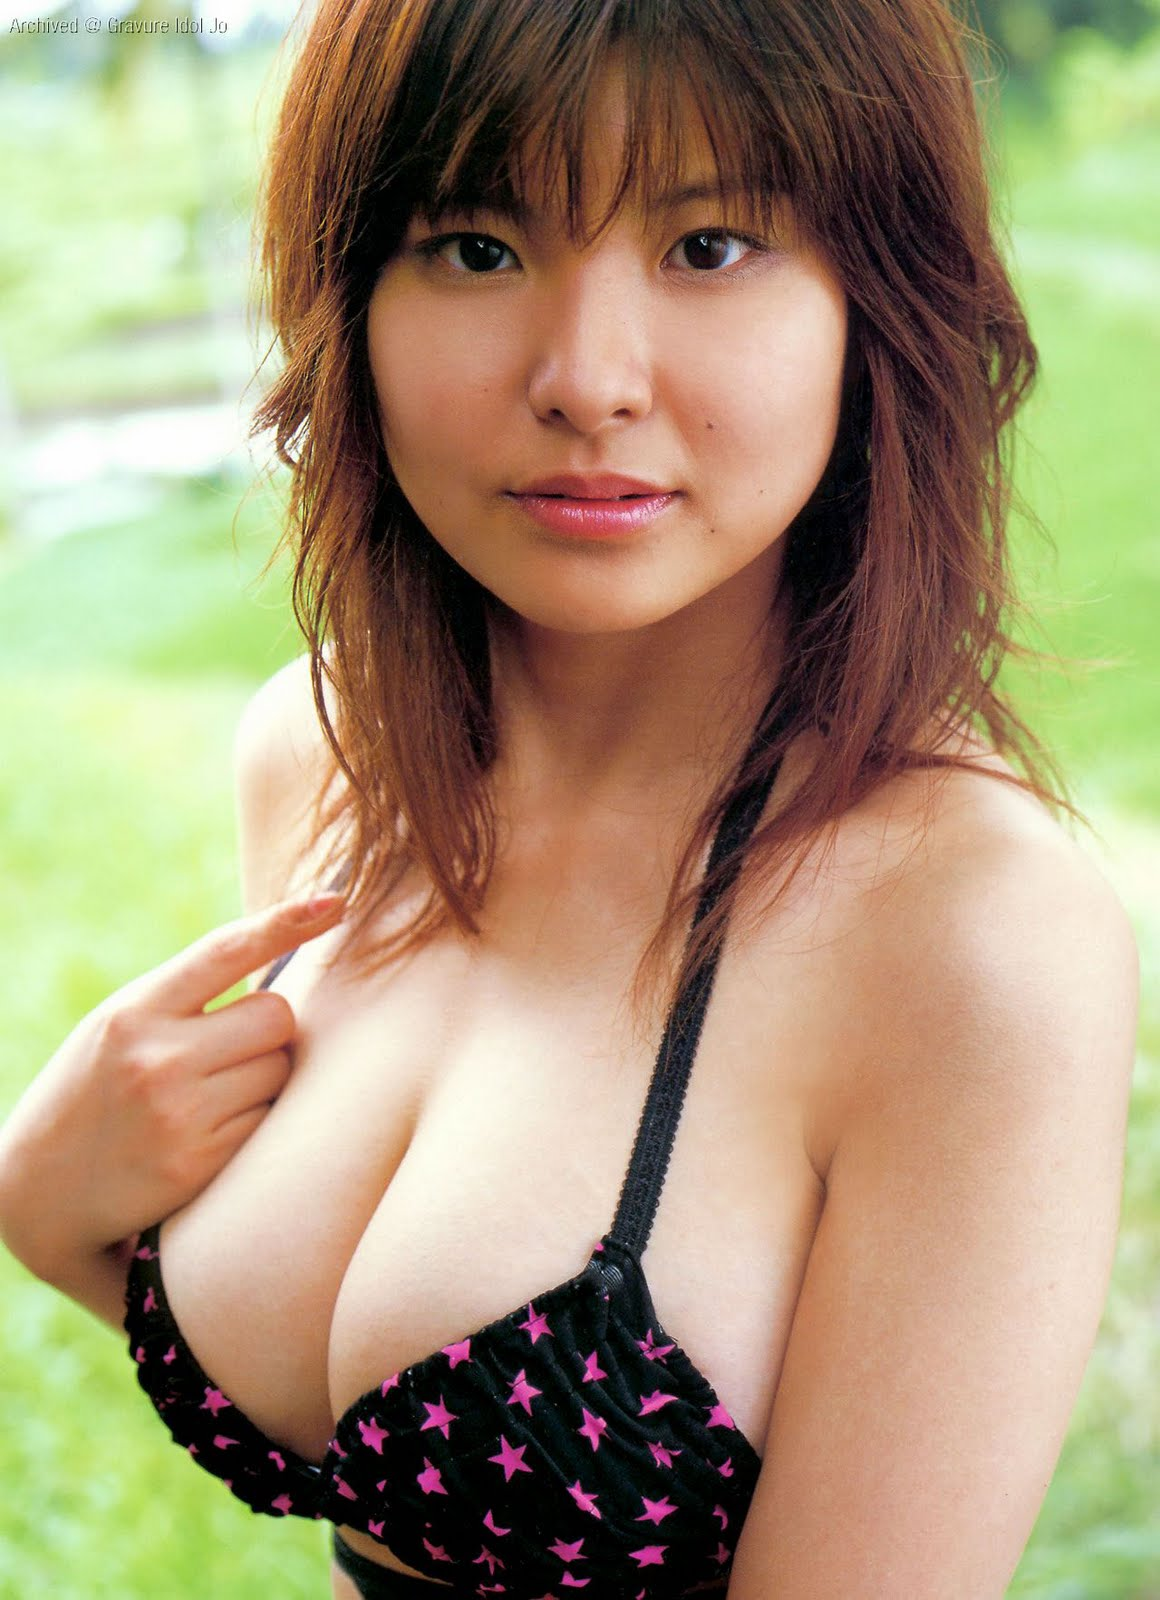 Miri Hanai : Japanese gravure idol, Hot Model